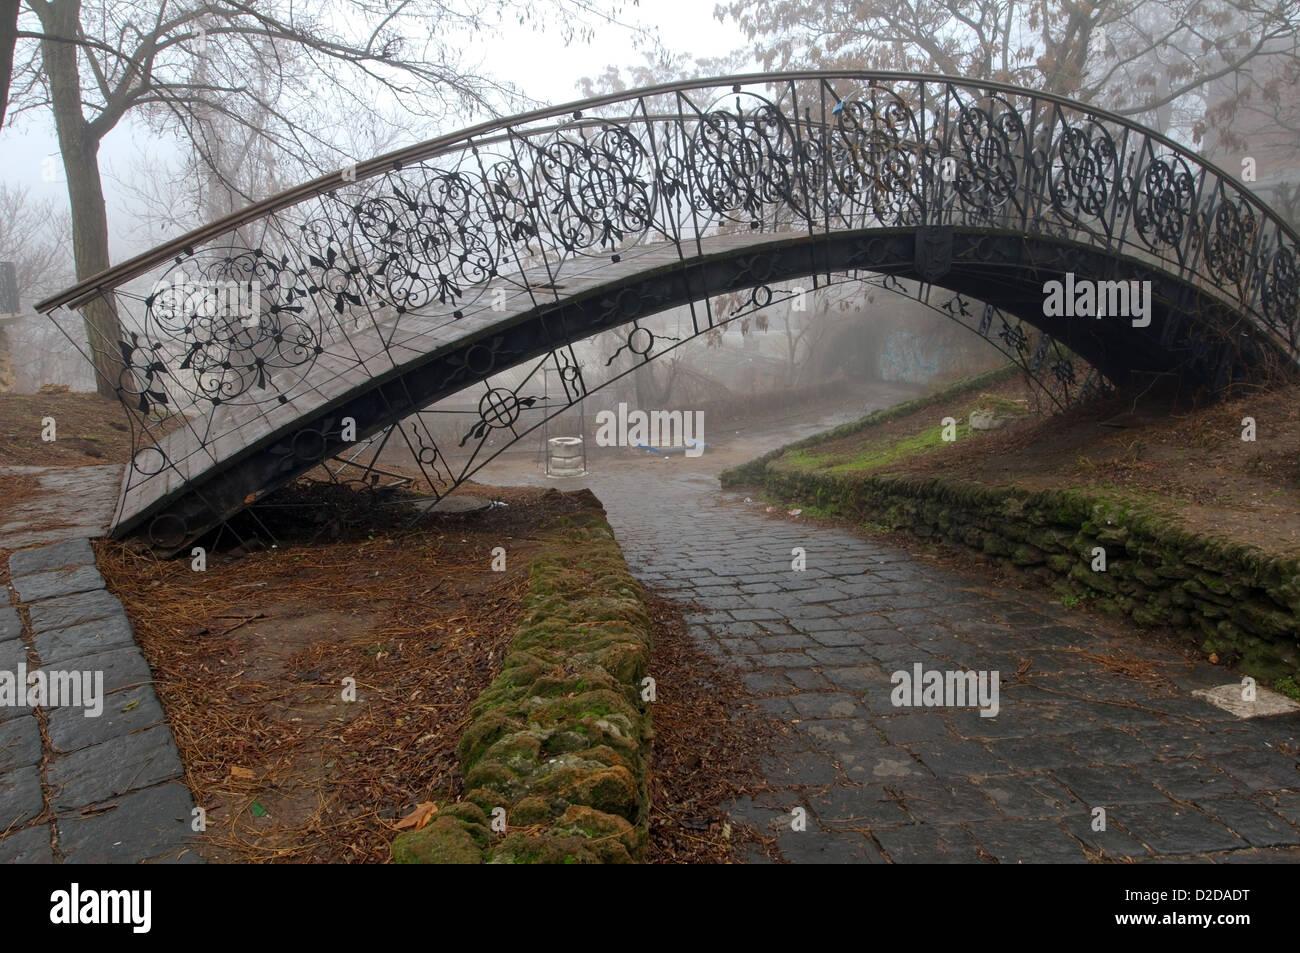 Humpbacked bridge in the fog. Odessa, Ukraine, Europe - Stock Image